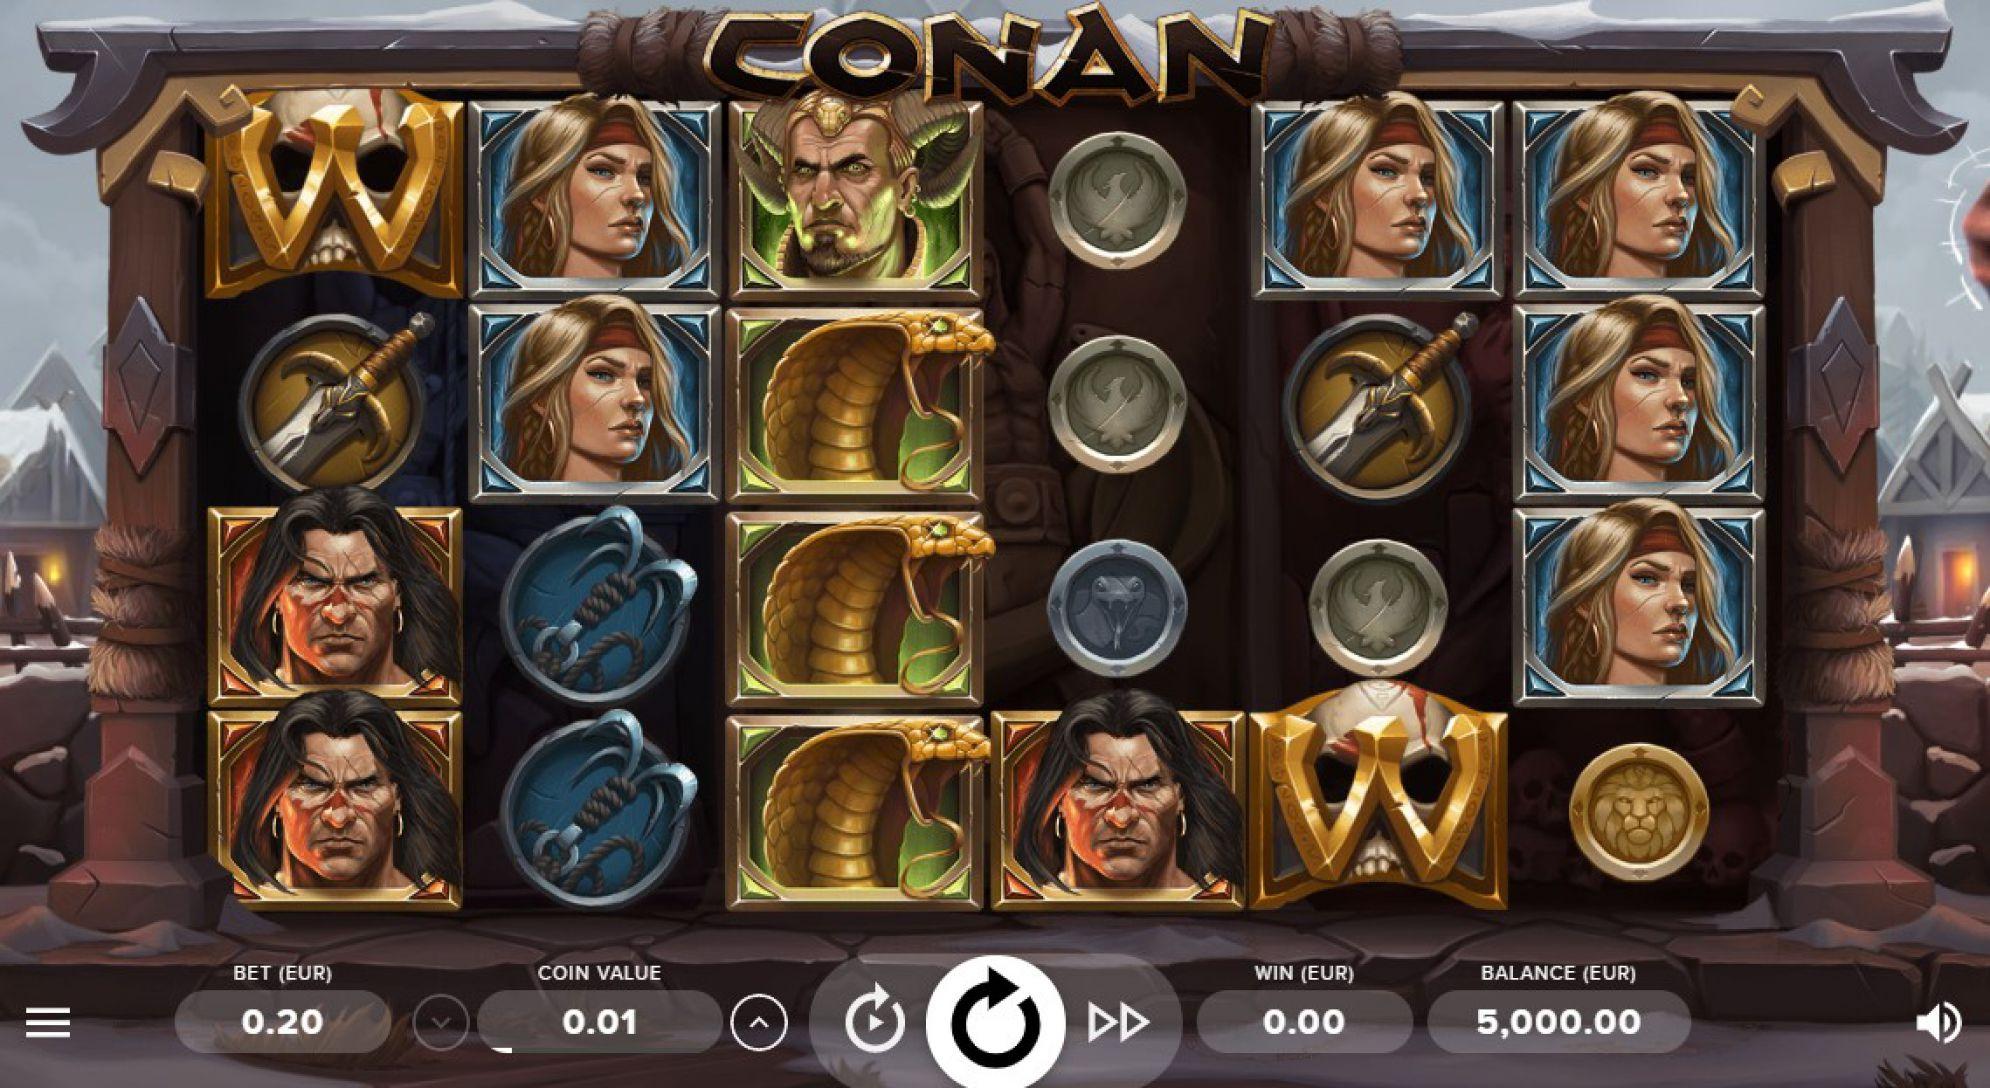 Conan Slot Images - CasinoTop